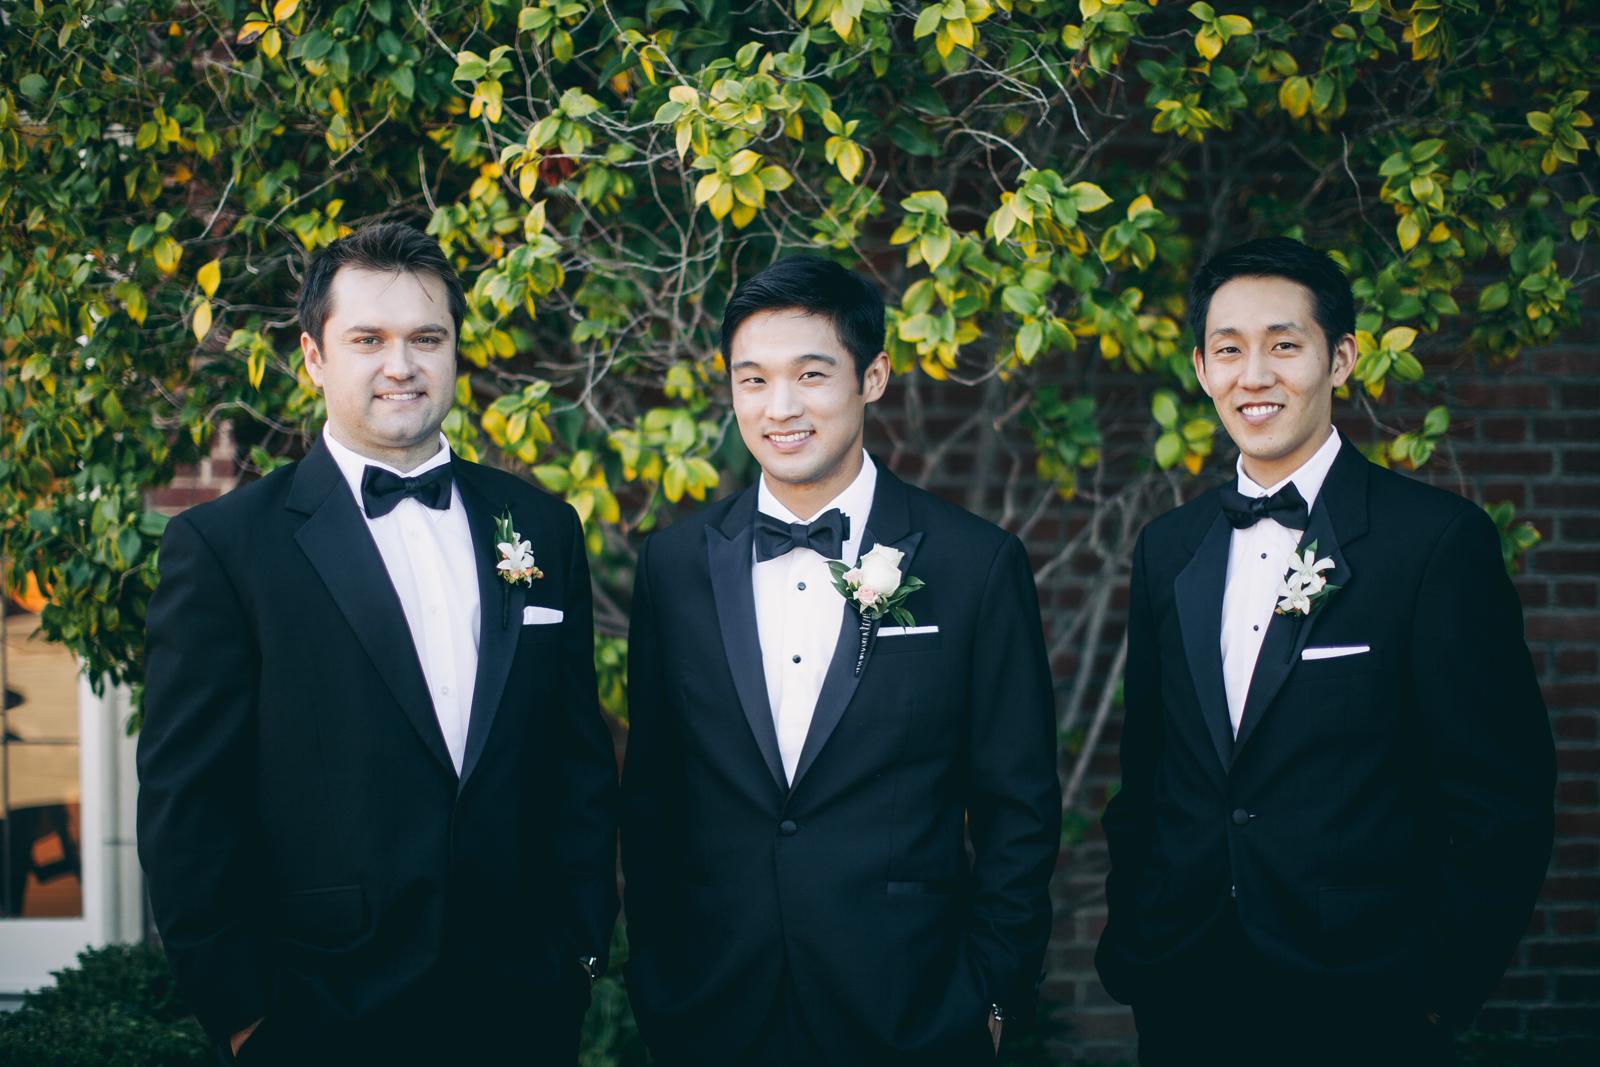 kohl_manison_wedding_photography_sarah_eric_ebony_siovhan_bokeh_photography_024.jpg